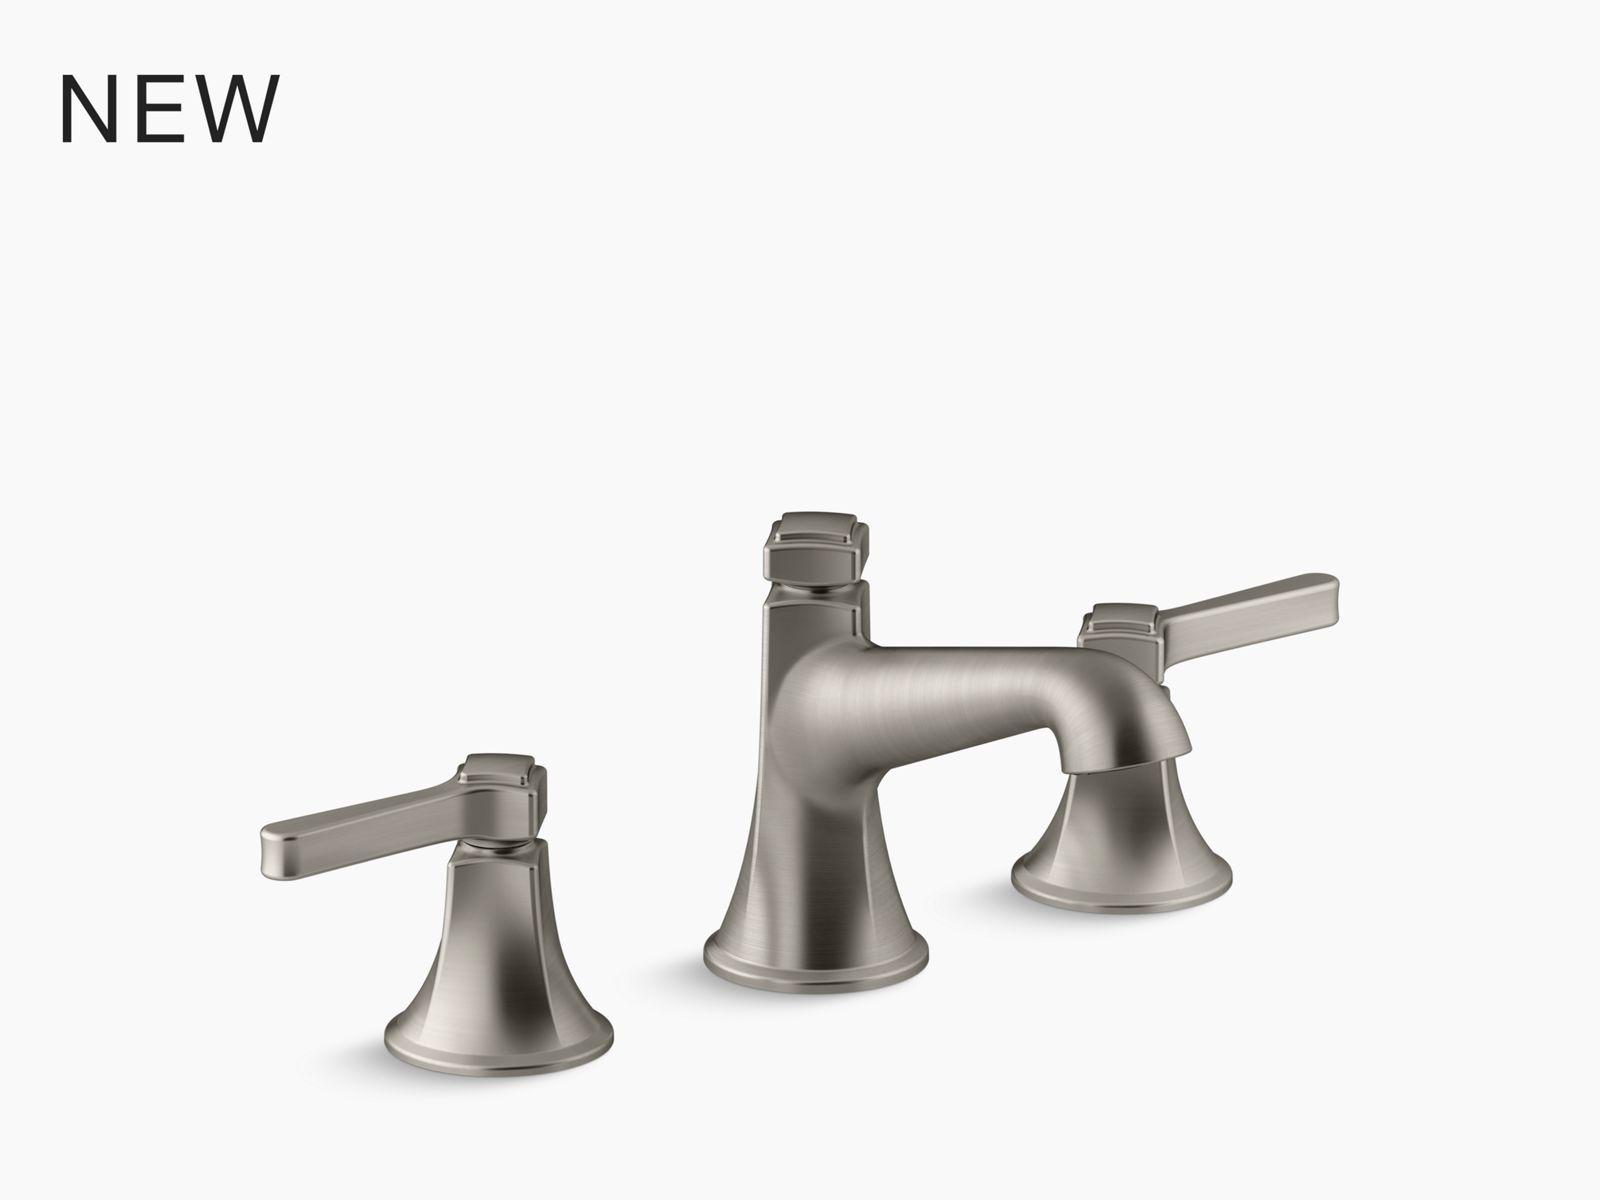 pro inspired 33 x 22 x 9 top mount undermount single bowl kitchen sink kit